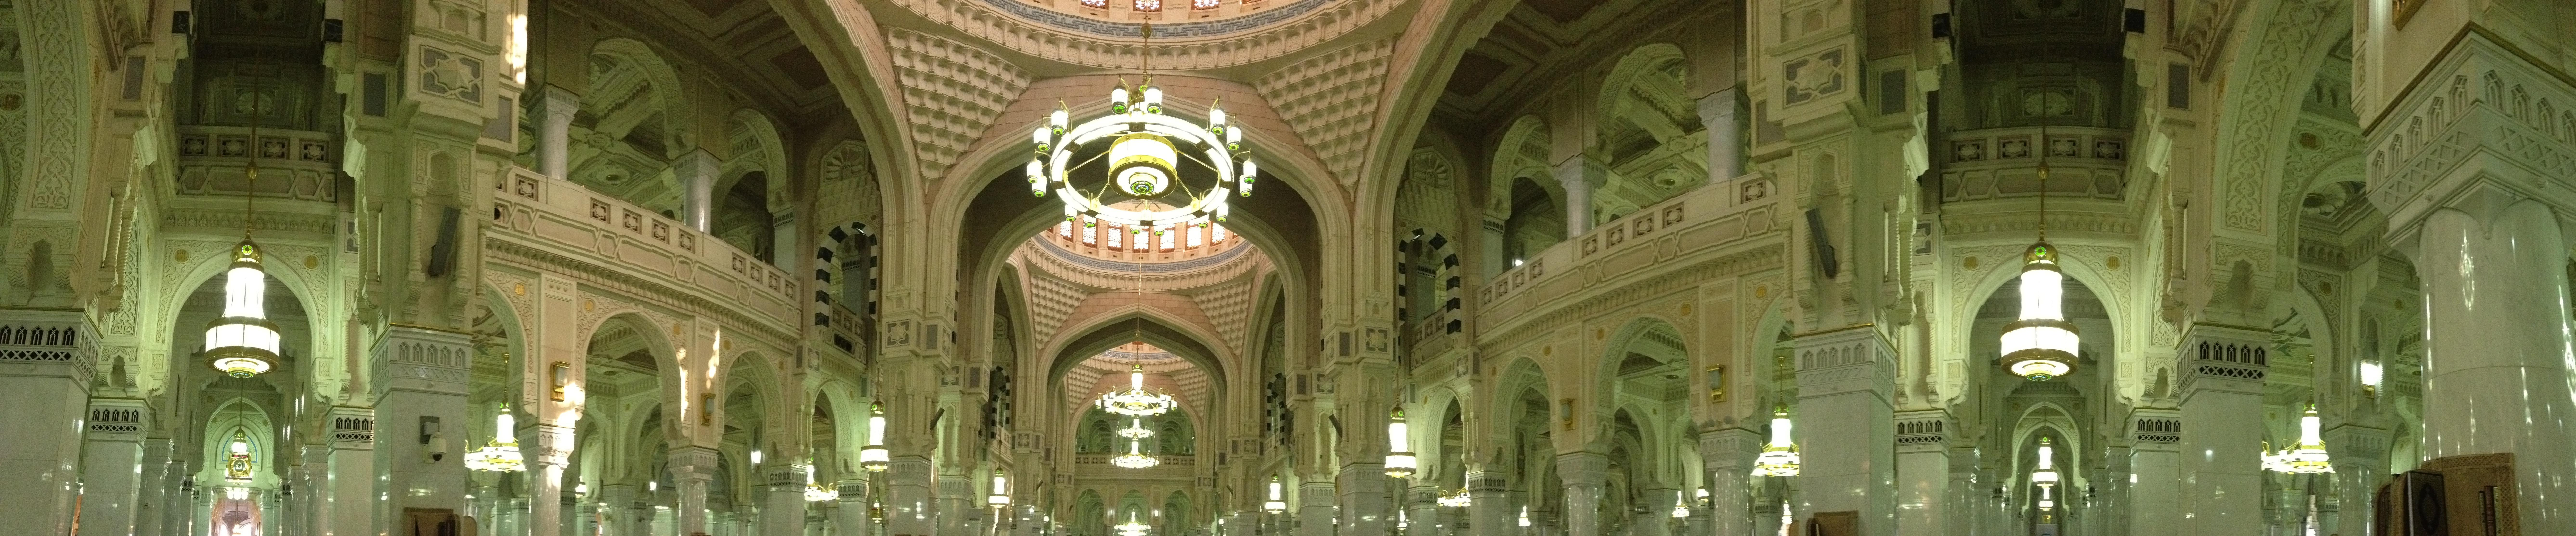 Masjid e Haram Panorama 1